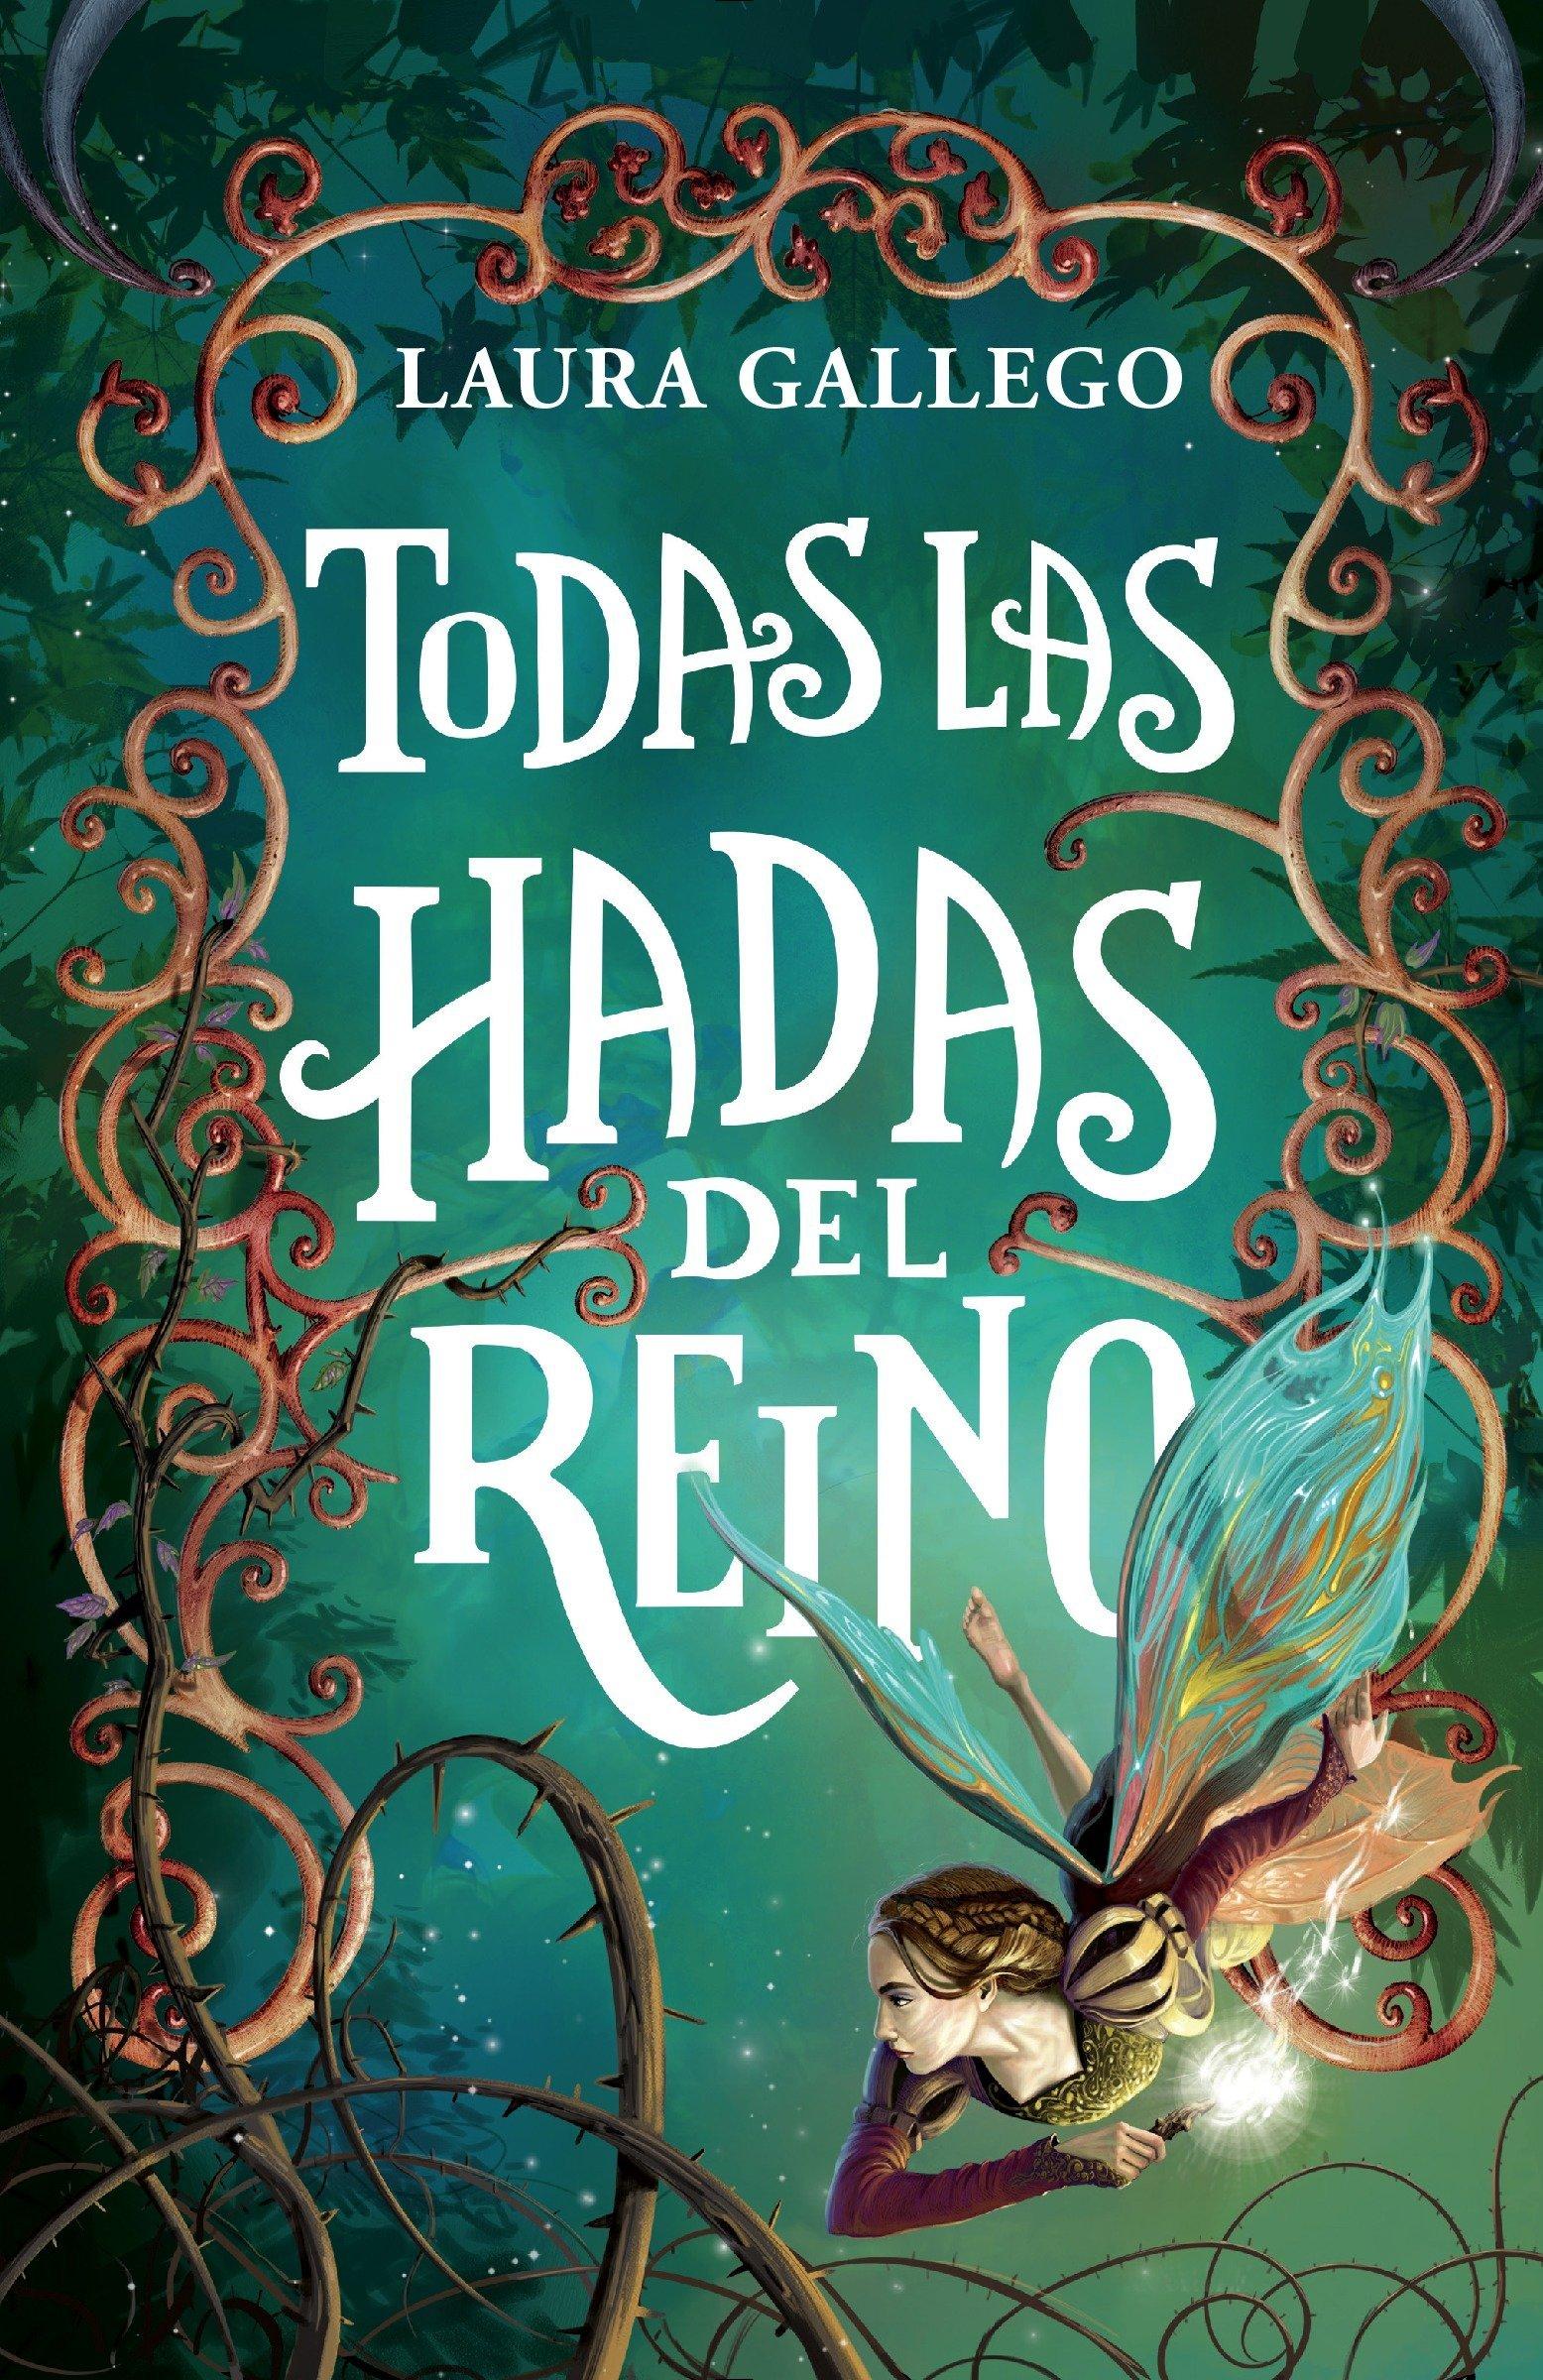 Todas Las Hadas del Reino Tapa blanda – 12 may 2015 Laura Gallego RANDOM HOUSE ESPANOL 1101912510 Fairy godmothers